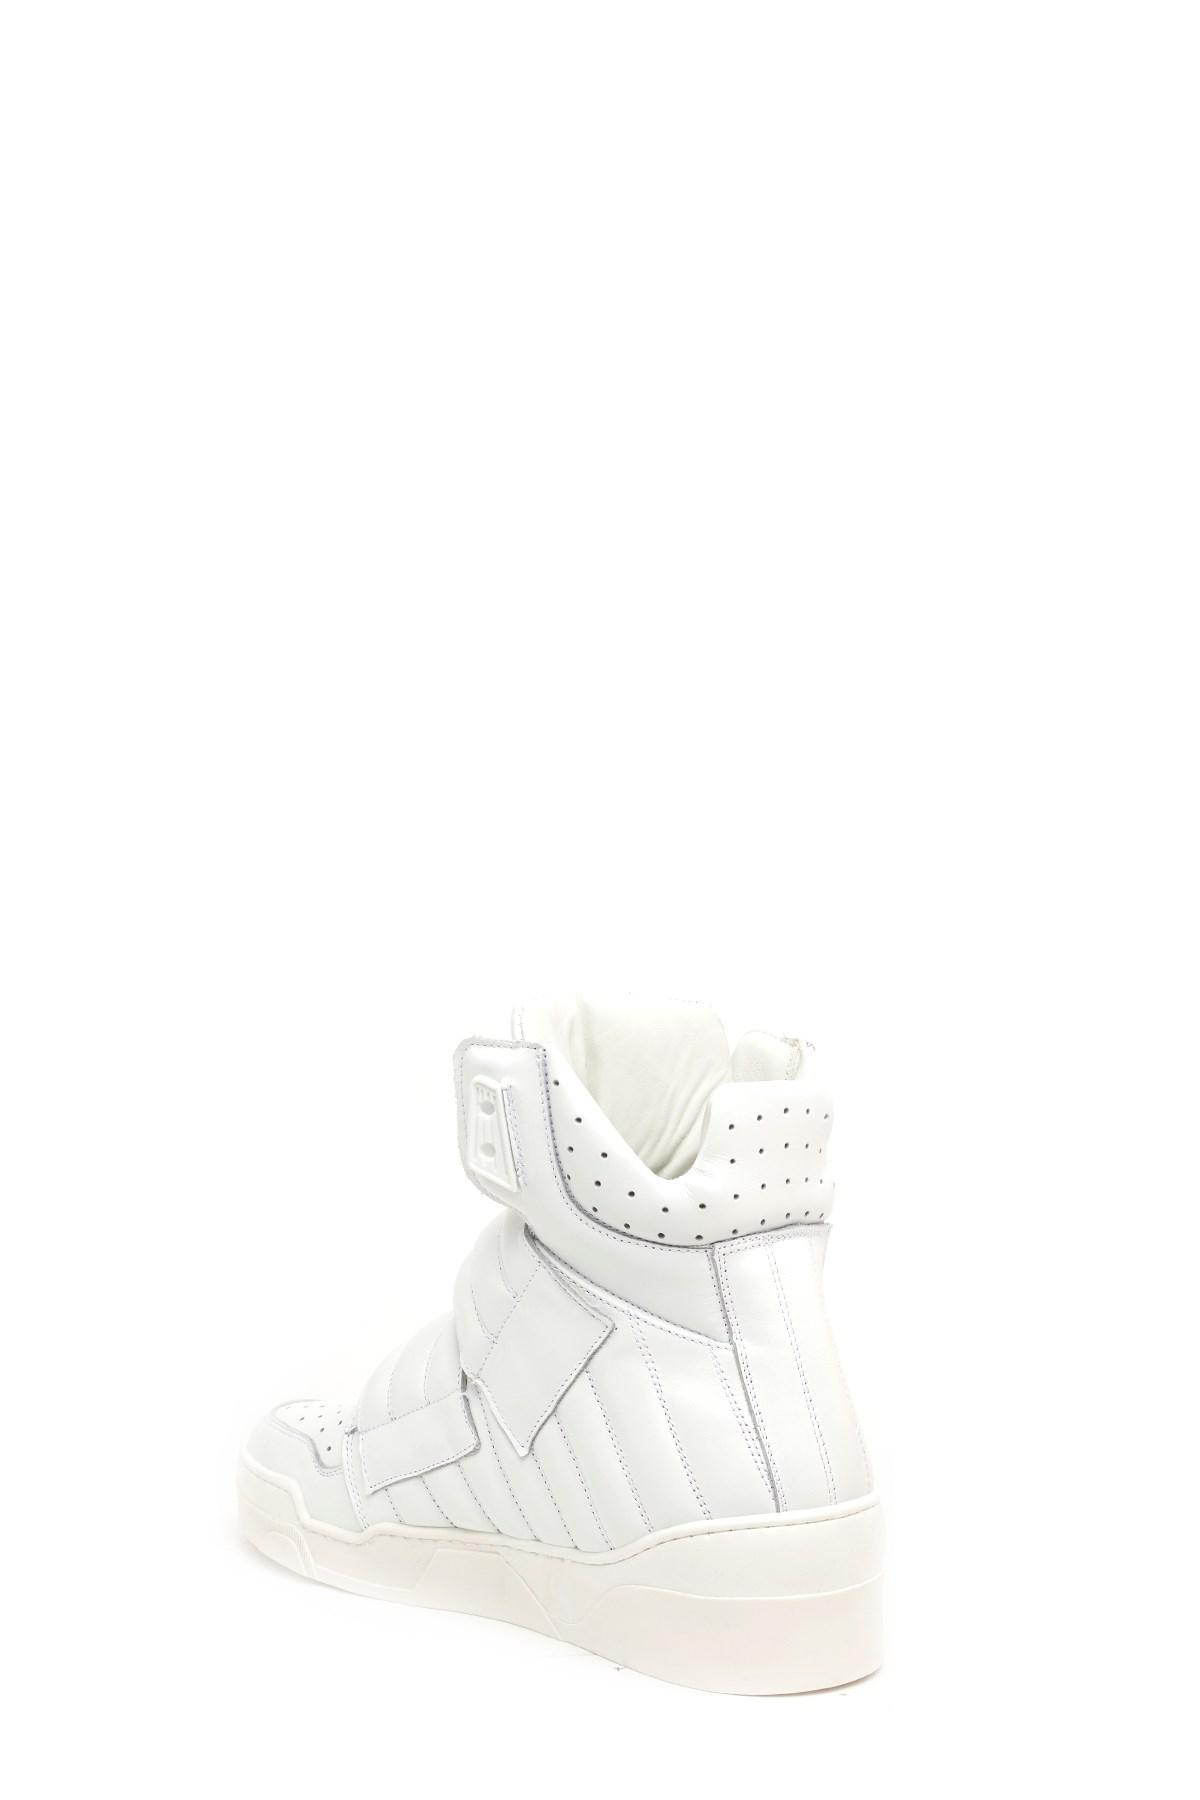 bda383ffcbe Lyst - Les Hommes High Sneakers for Men